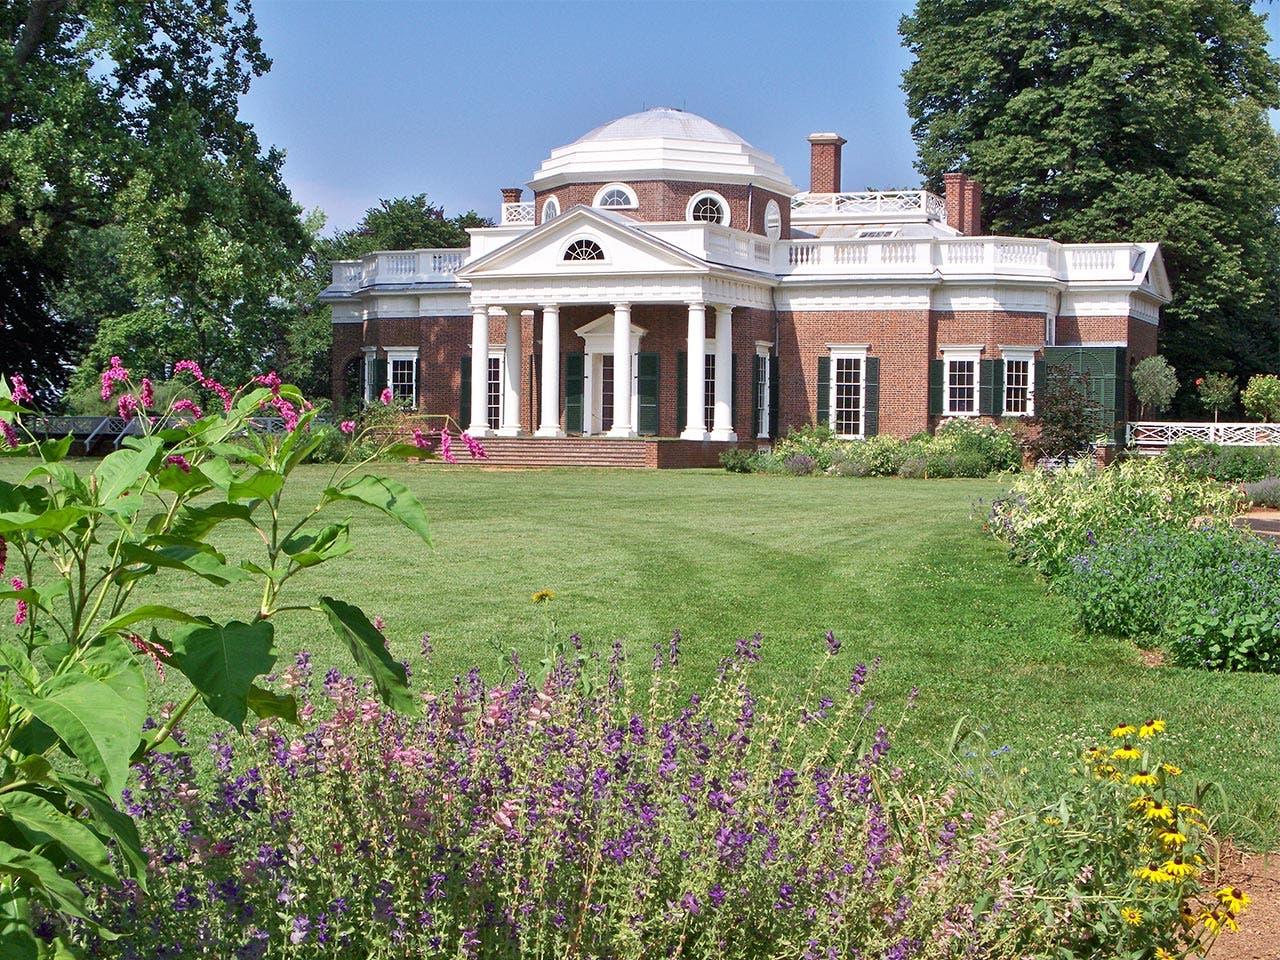 House of Thomas Jefferson | Bruce Ellis/Shutterstock.com